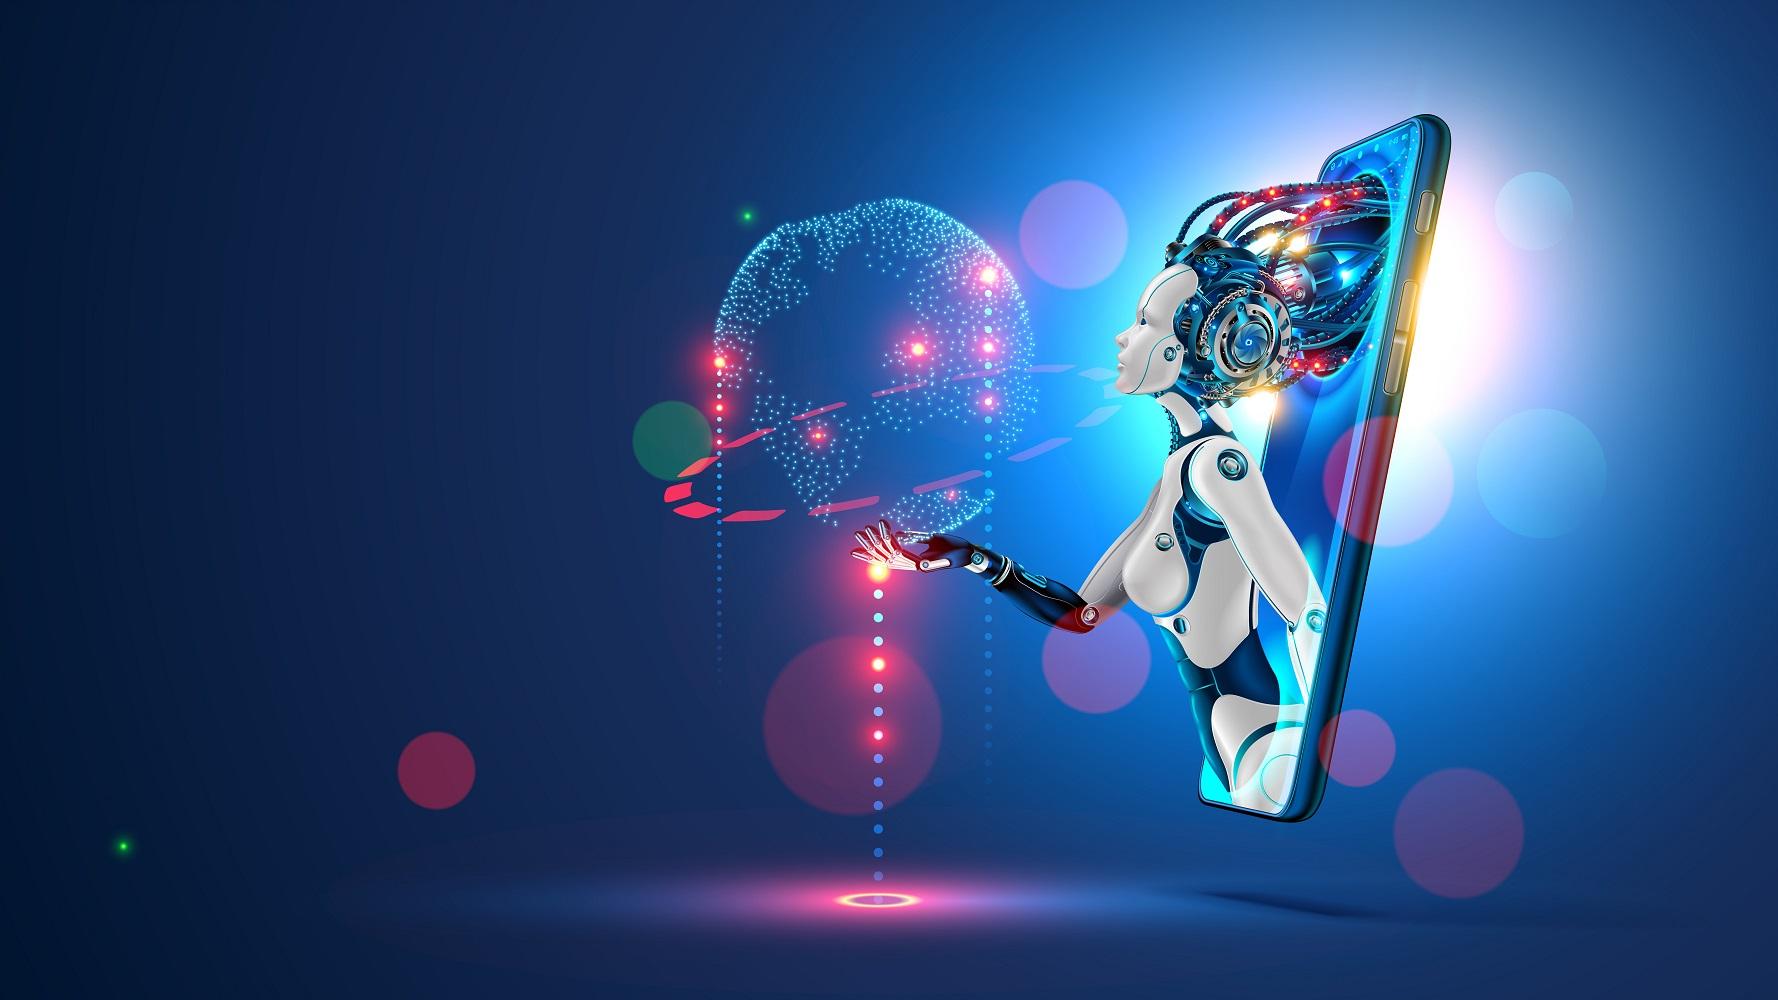 API Brings Innovation